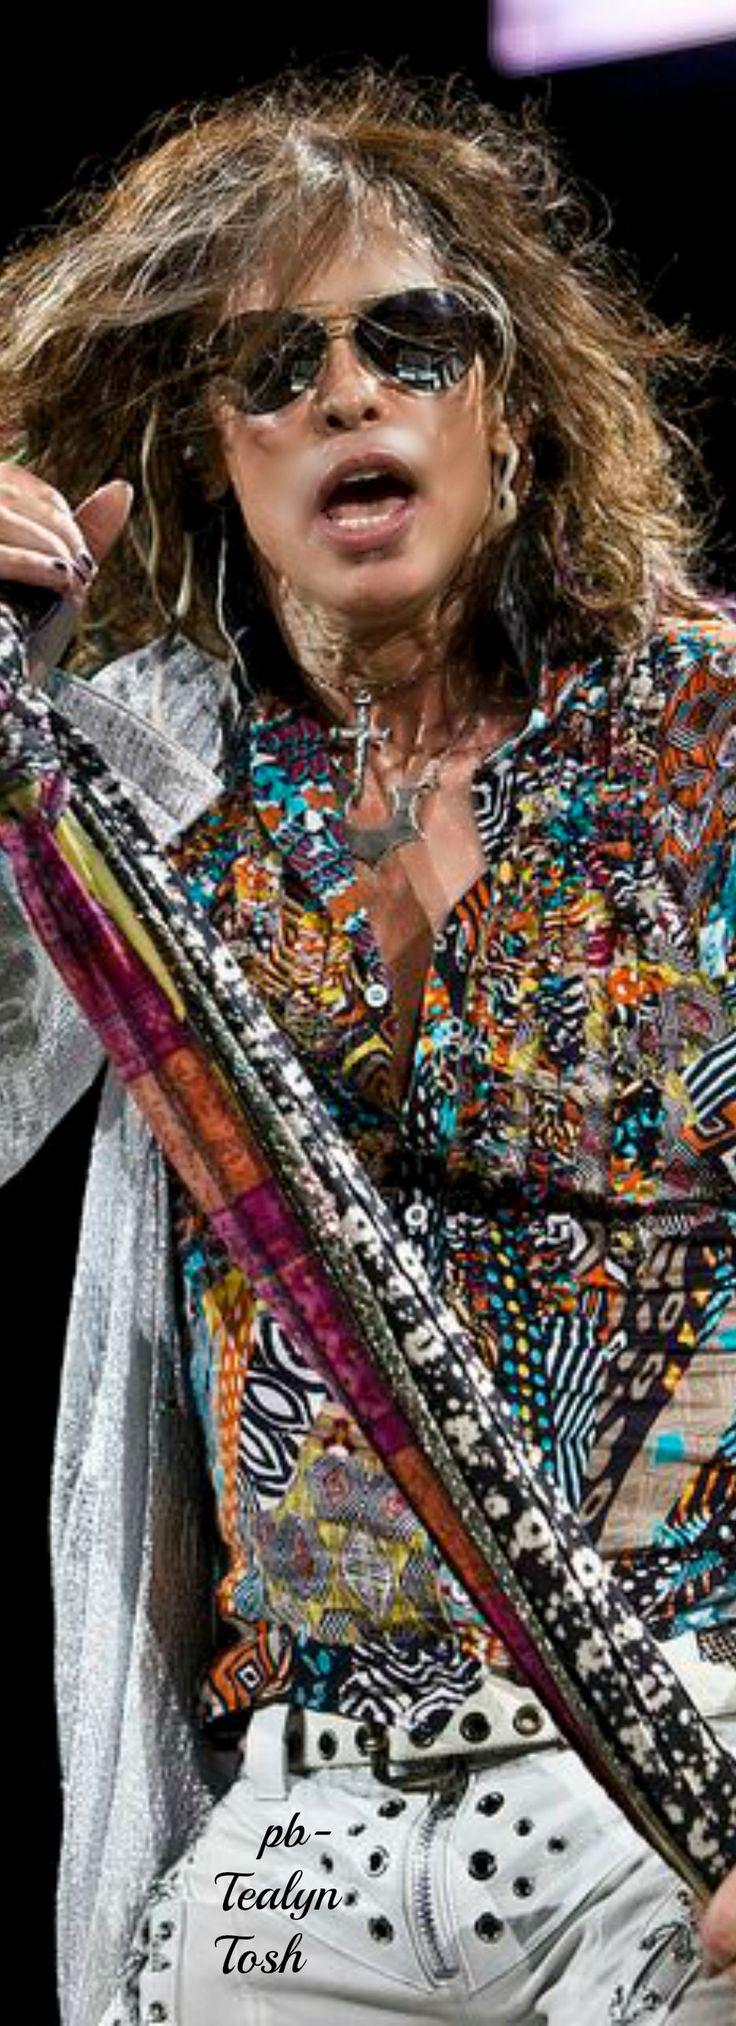 Steven Tyler (Aerosmith)❇Téa Tosh                                                                                                                                                                                 More